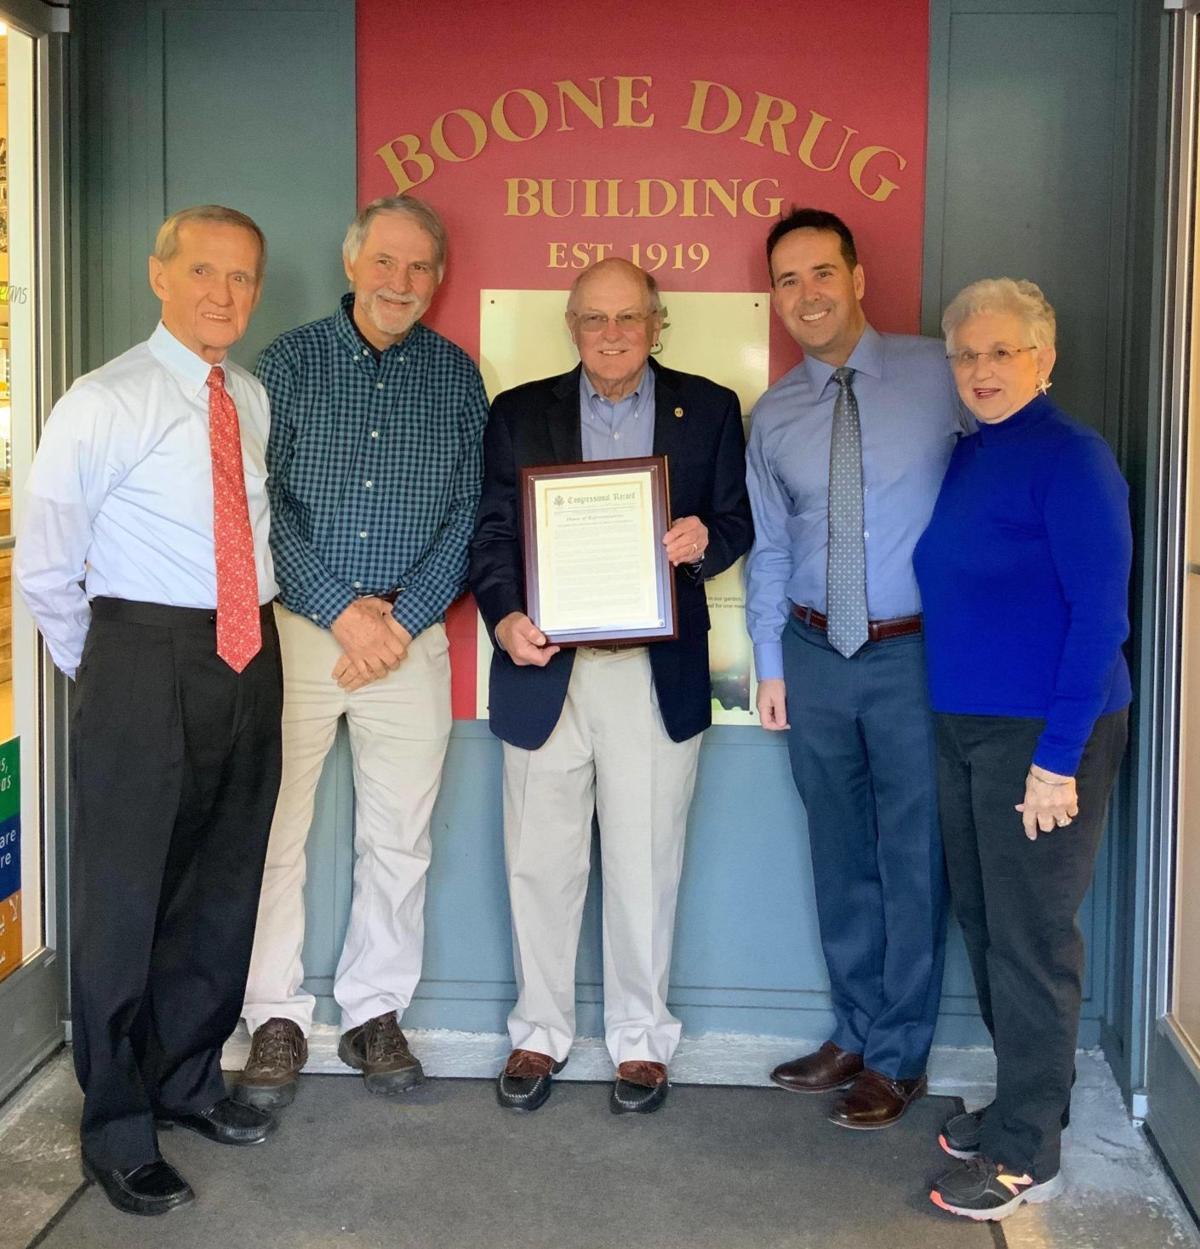 Boone Drug 100 years